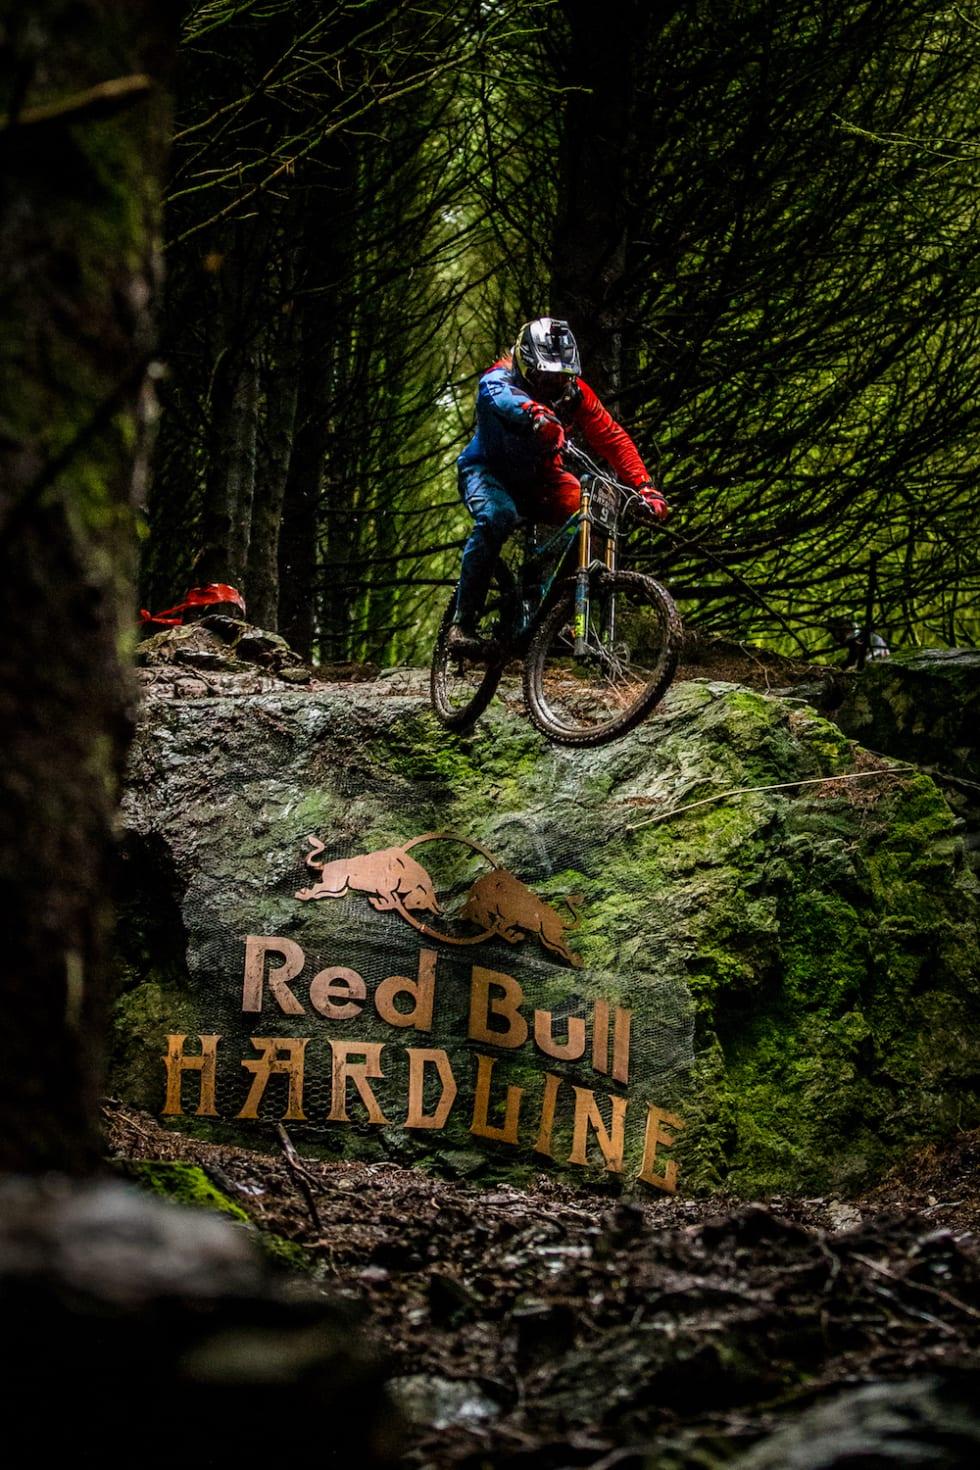 Brage Vestavik - Red Bull Hardline 2017 - Red Bull Content Pool 1000x1500